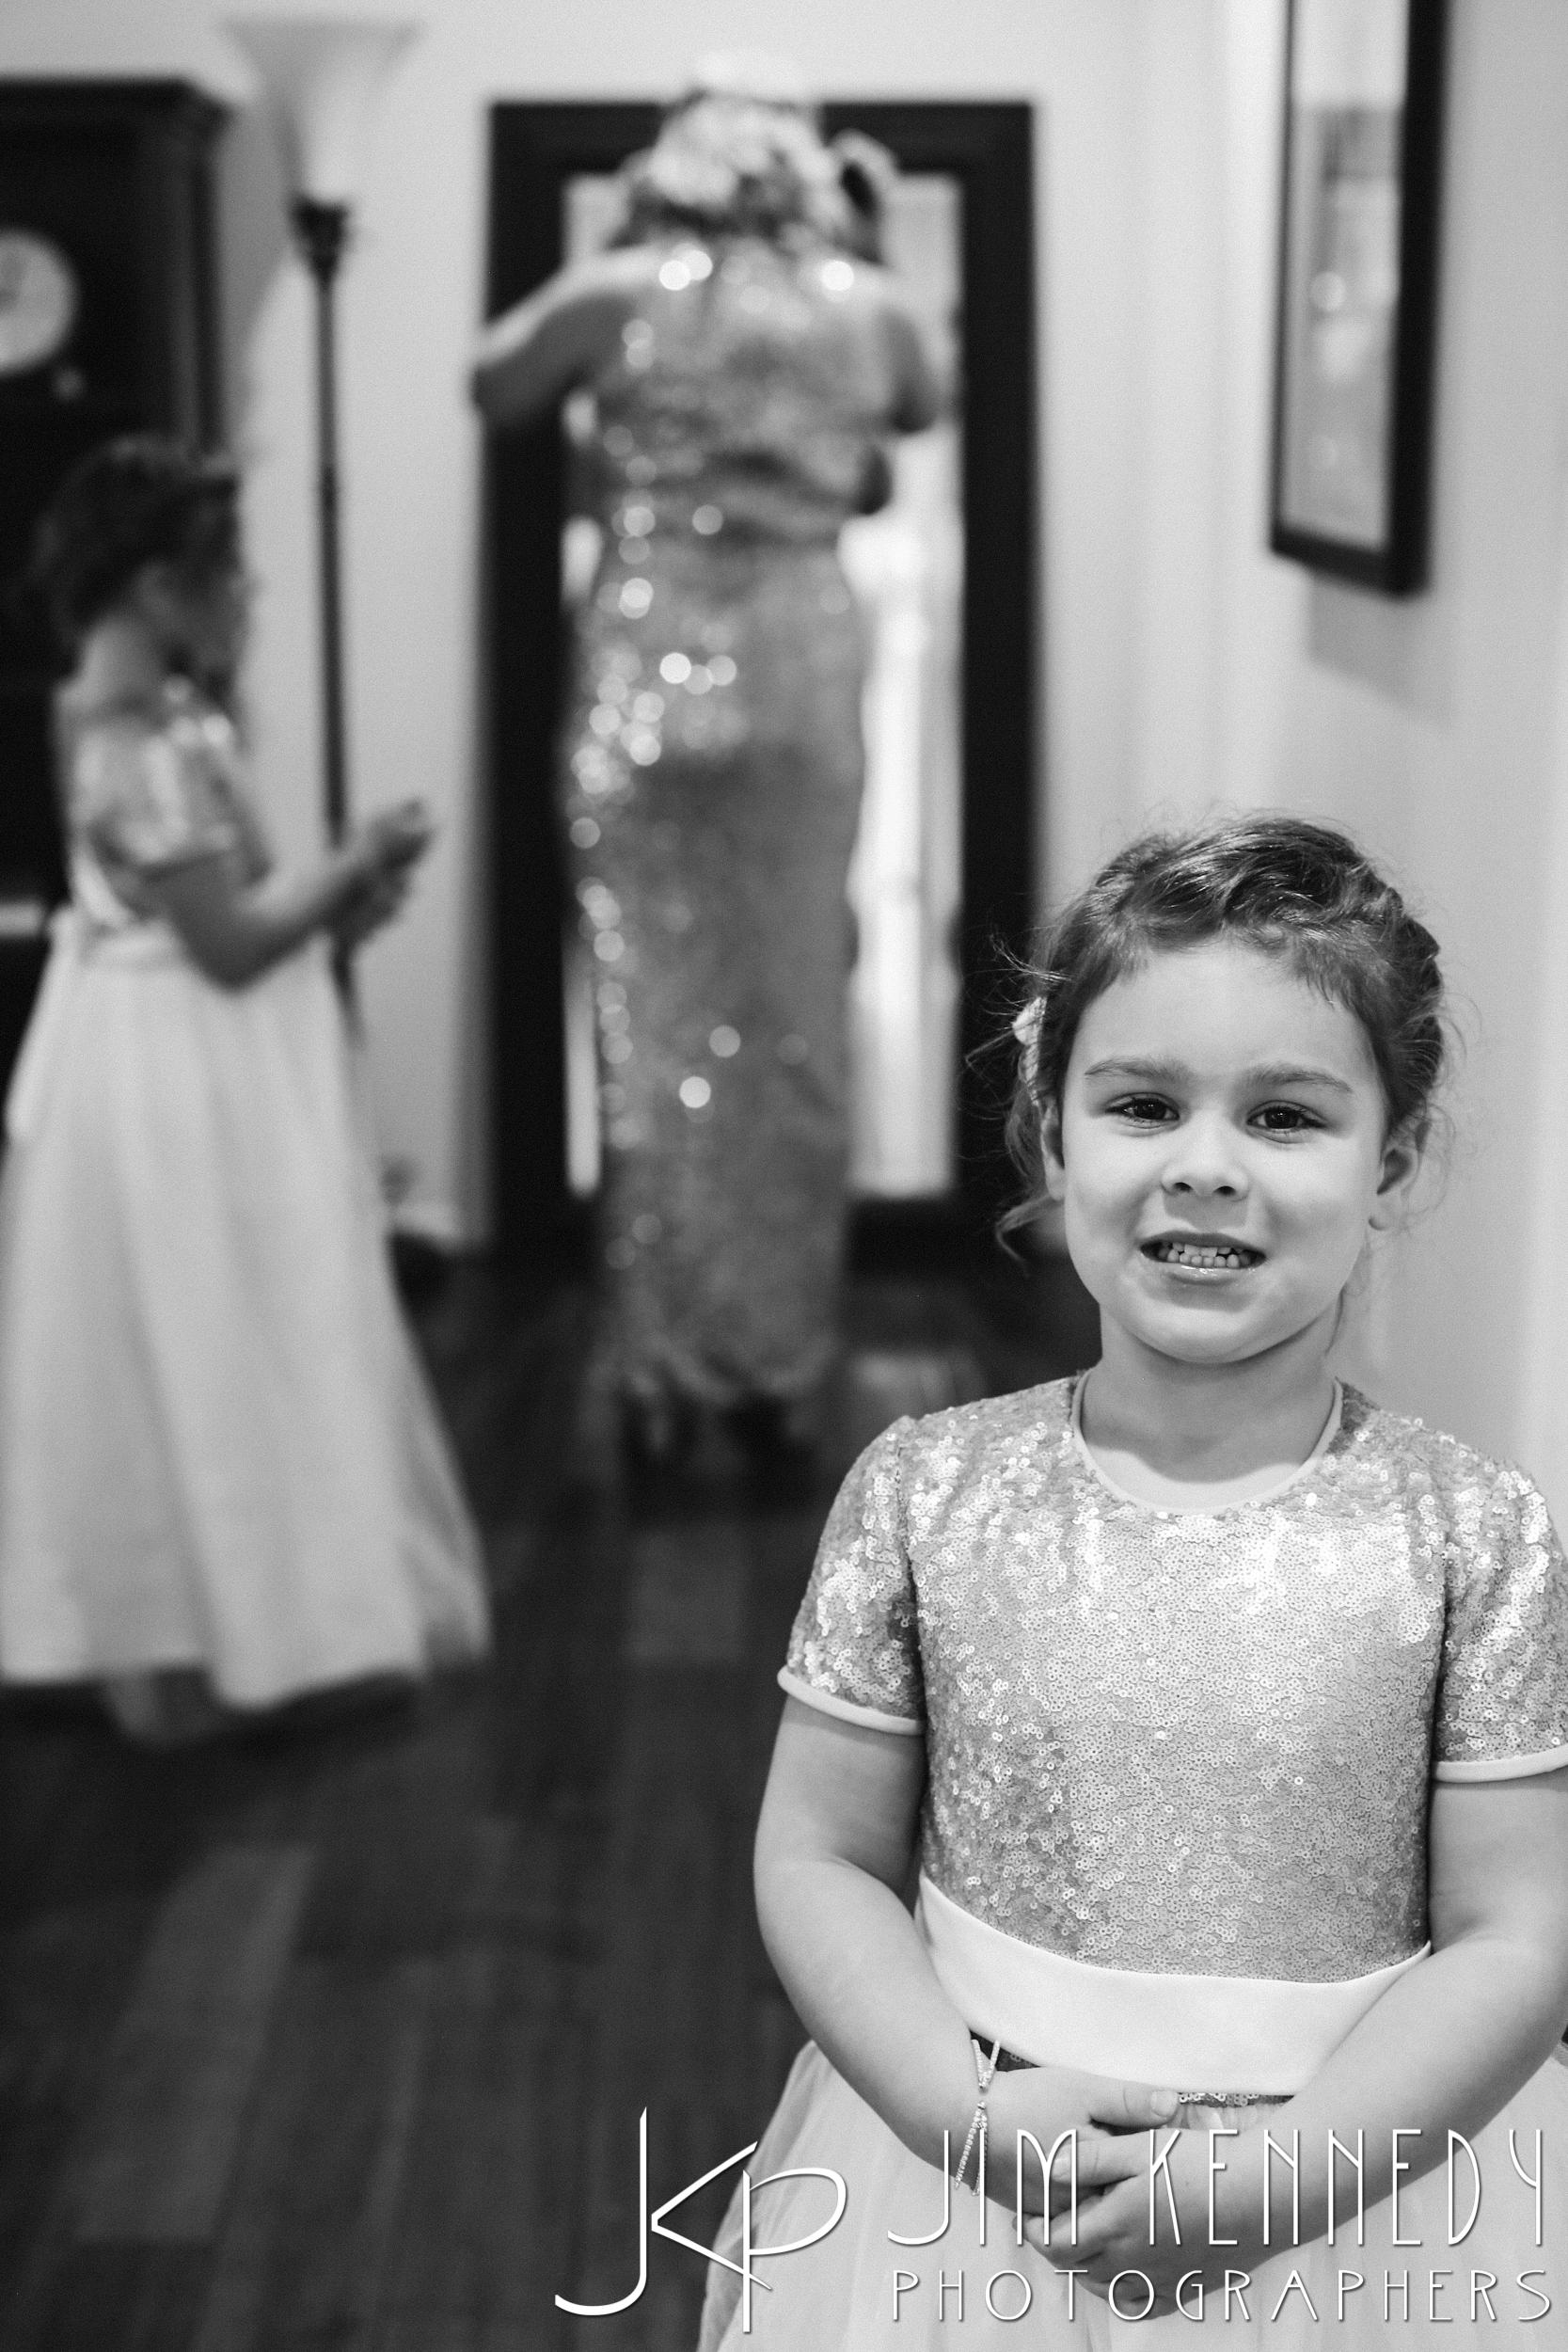 jim_kennedy_photographers_highland_springs_wedding_caitlyn_0021.jpg